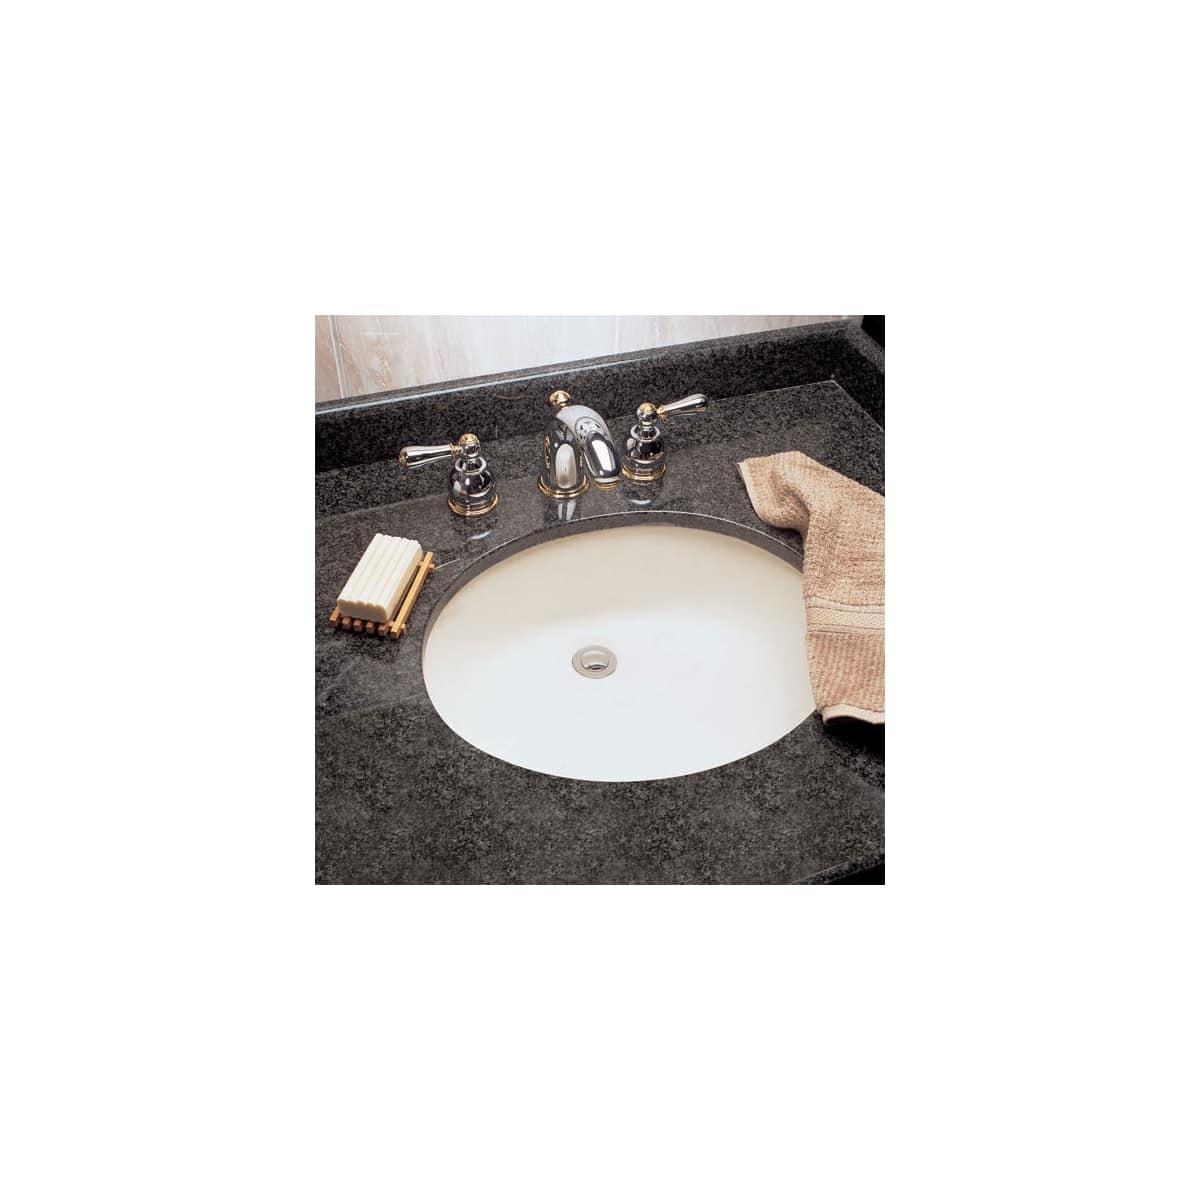 American standard 0495 221 020 white ovalyn 15 undermount porcelain bathroom sink faucet com